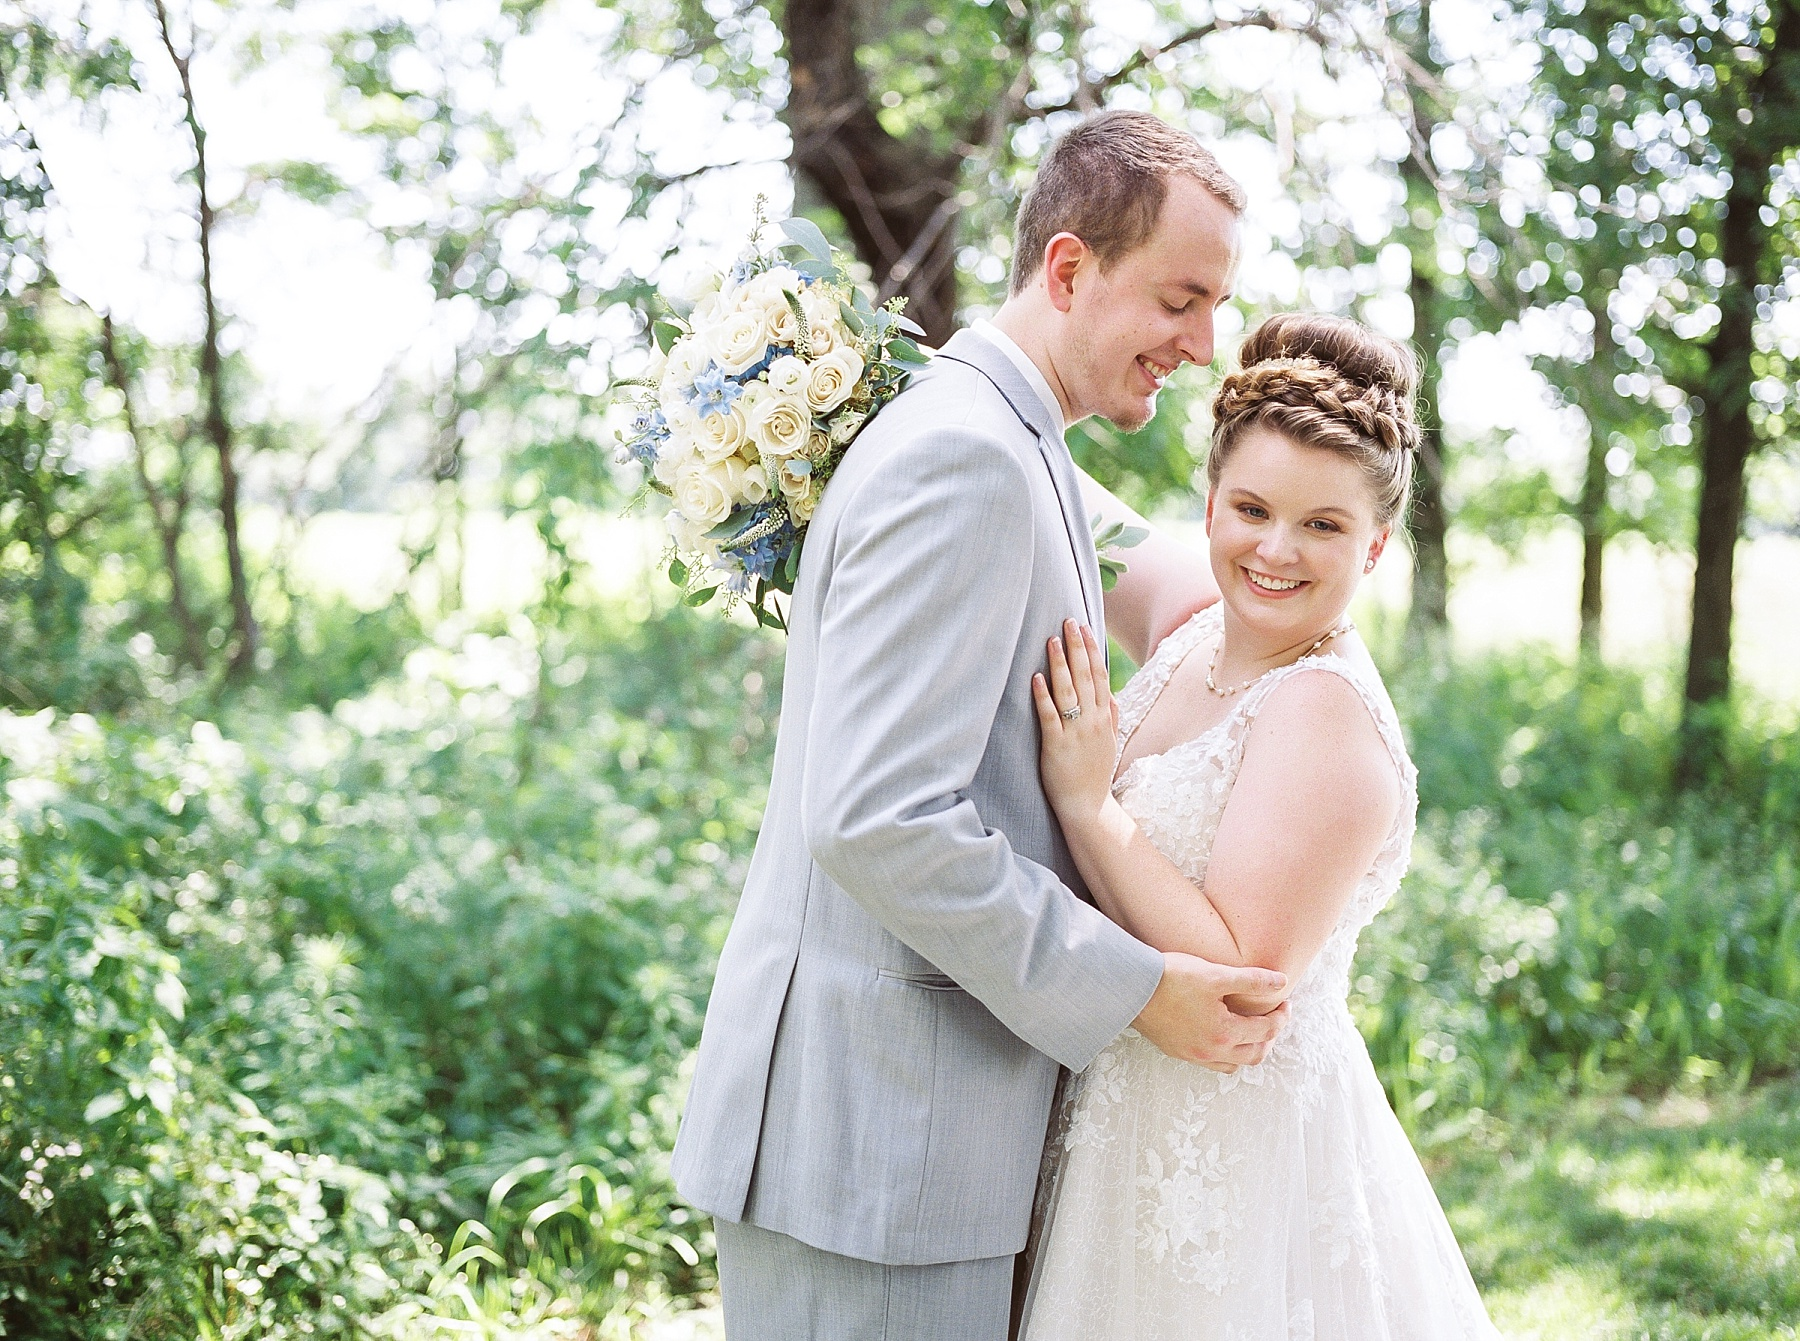 Intimate Summer Wedding at Emerson Fields by Kelsi Kliethermes Photography Best Missouri and Maui Wedding Photographer_0009.jpg